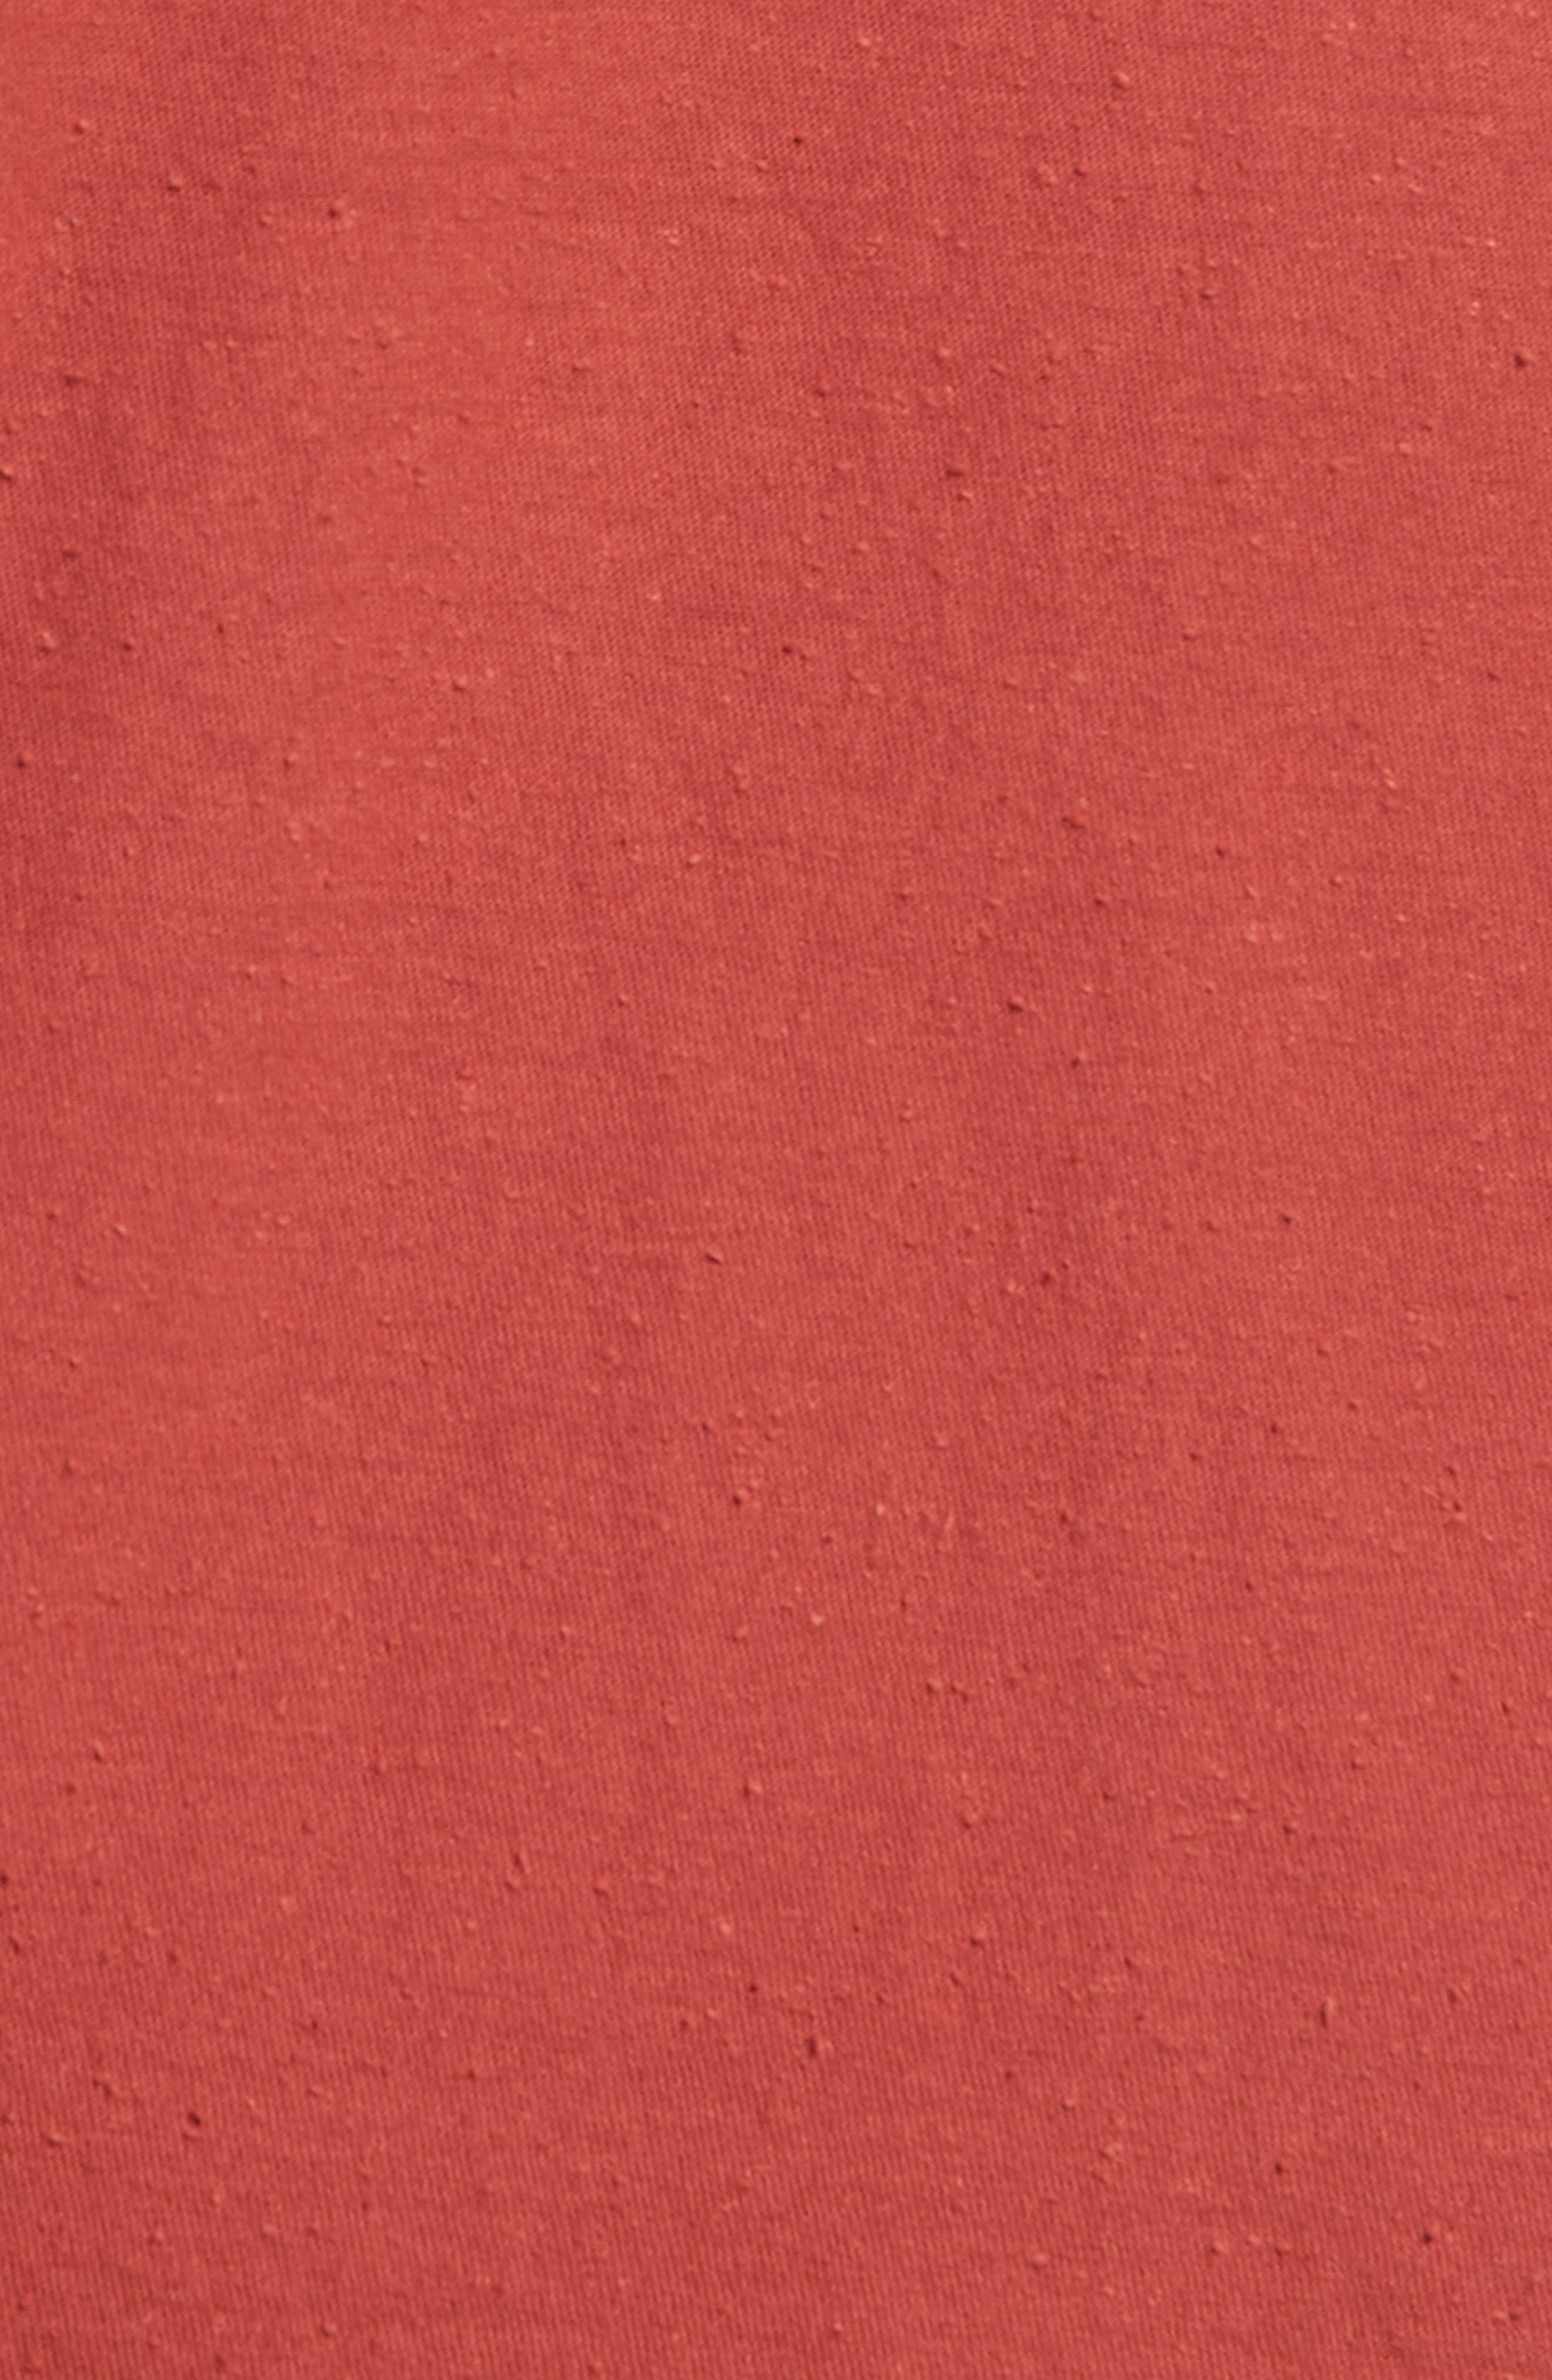 Nep Cotton Pocket T-Shirt,                             Alternate thumbnail 5, color,                             221